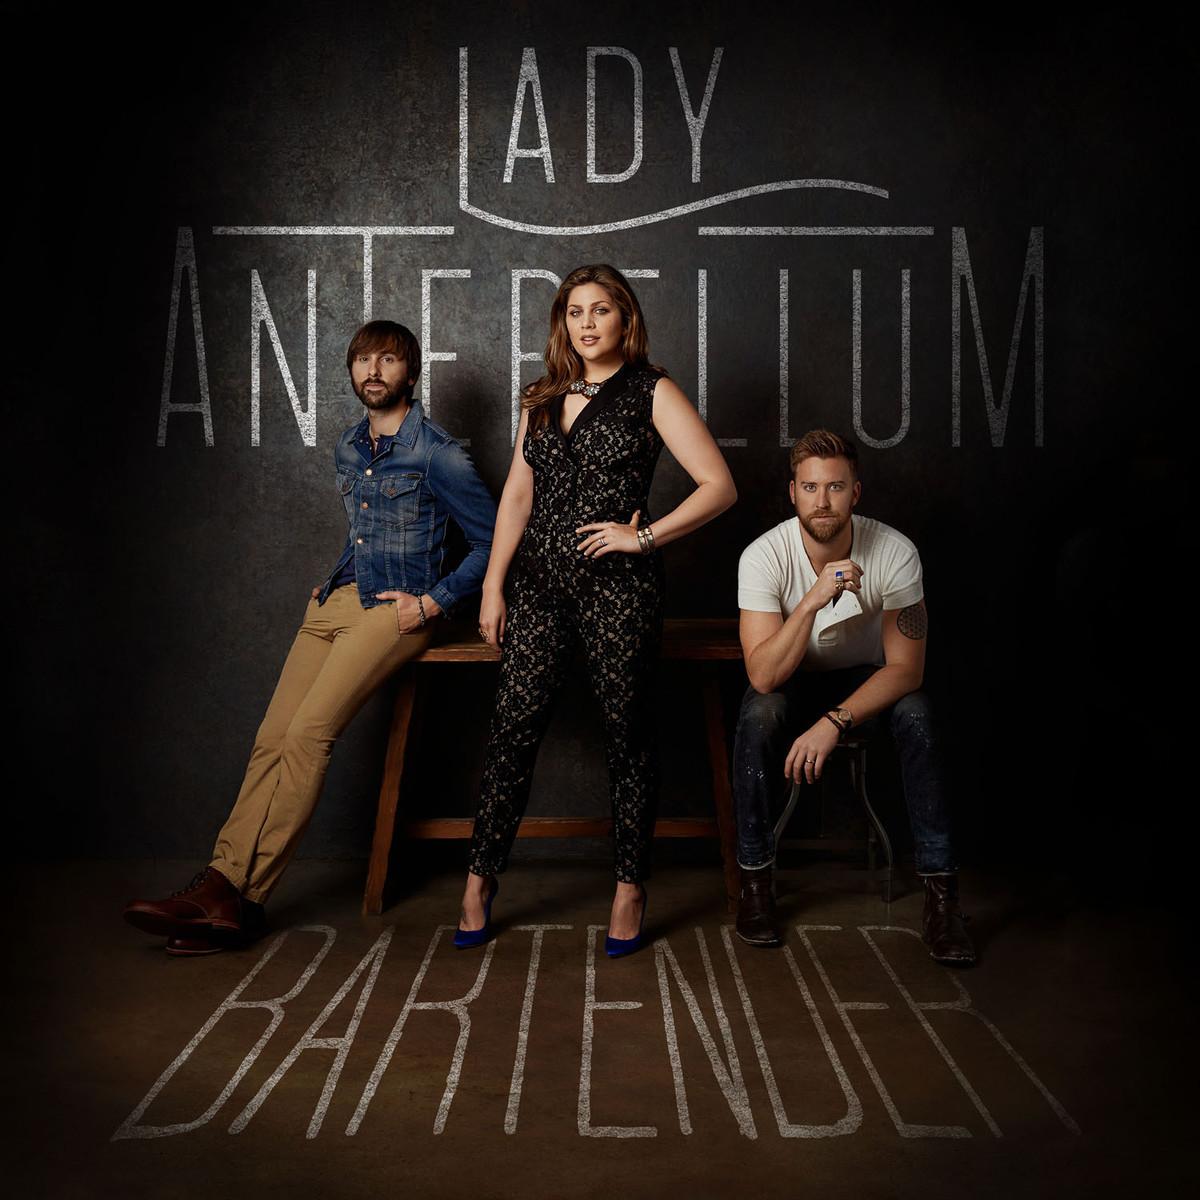 LADY ANTEBELLUM : BARTENDER